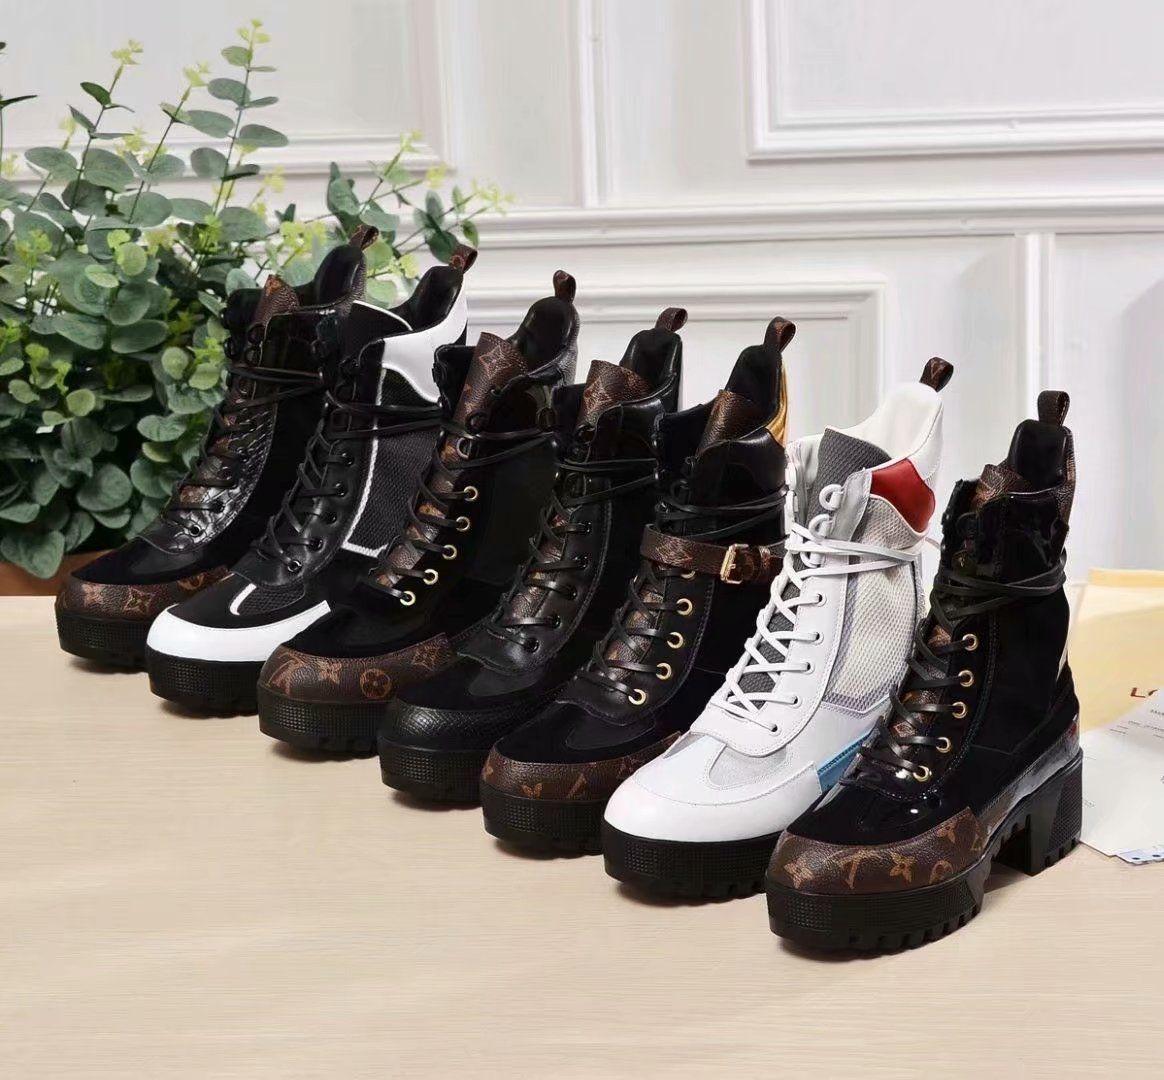 4572b8c6e4e 2018 Laureate Platform Desert Boot Black Heart Boots Overcloud Platform  Desert Boot Luxury Brand Martin Boots Size 35 42 Mid Calf Boots Womens Ankle  Boots ...